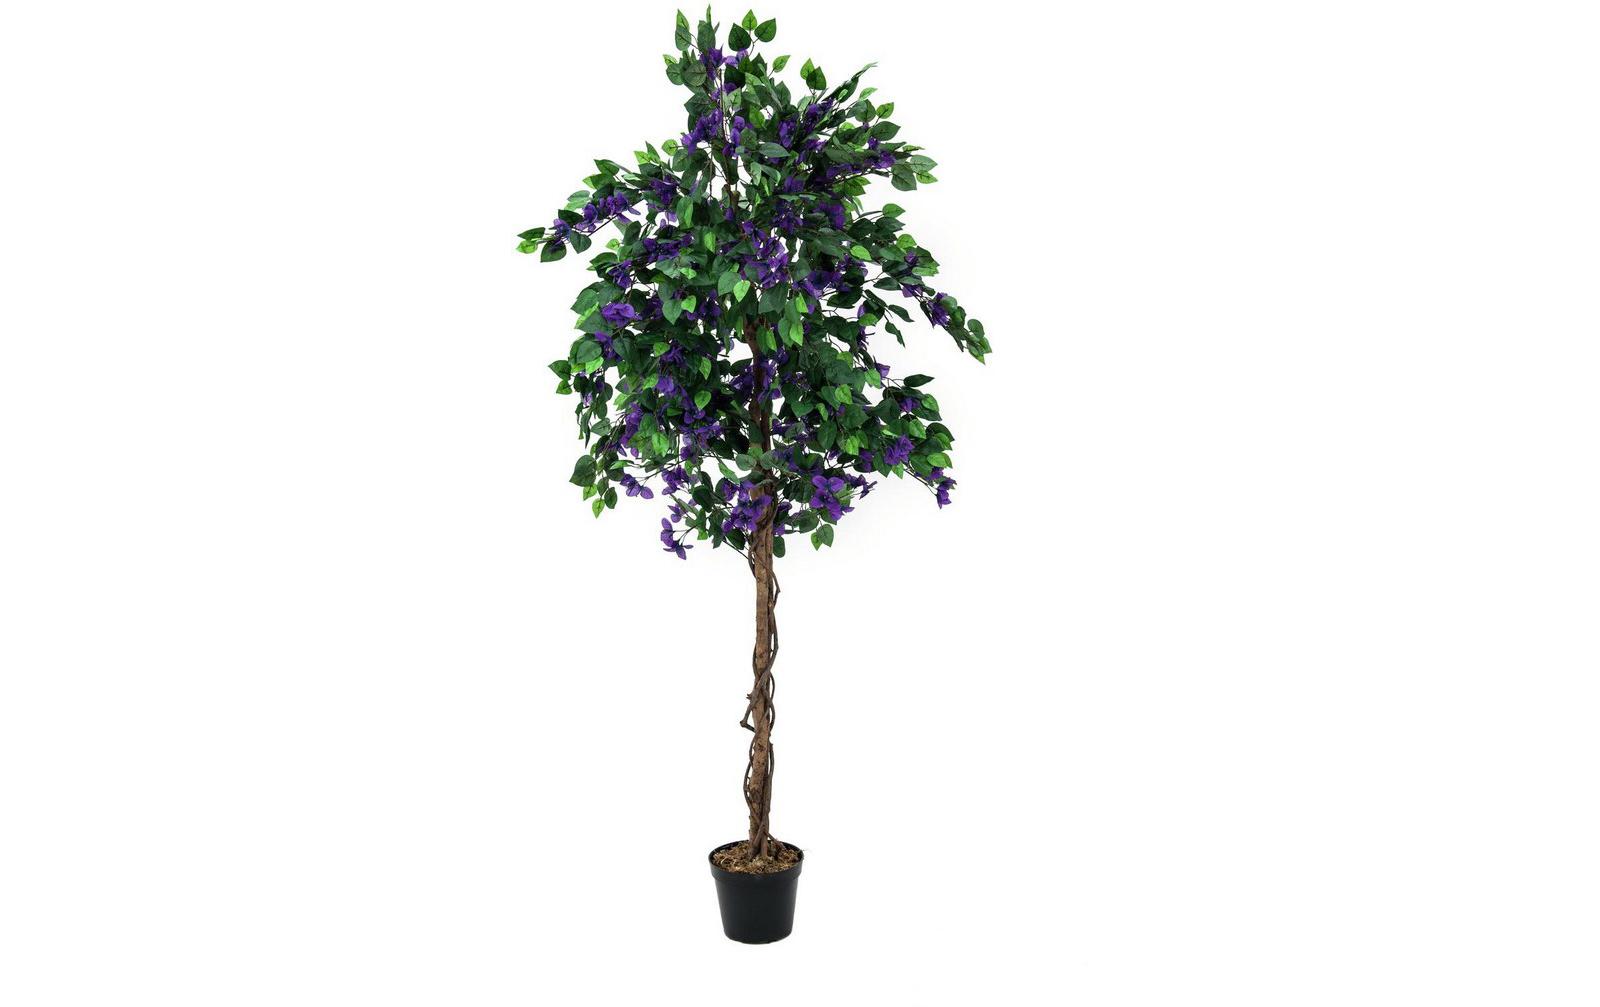 europalms-bougainvillea-lavendel-150cm-kunststoffpflanze